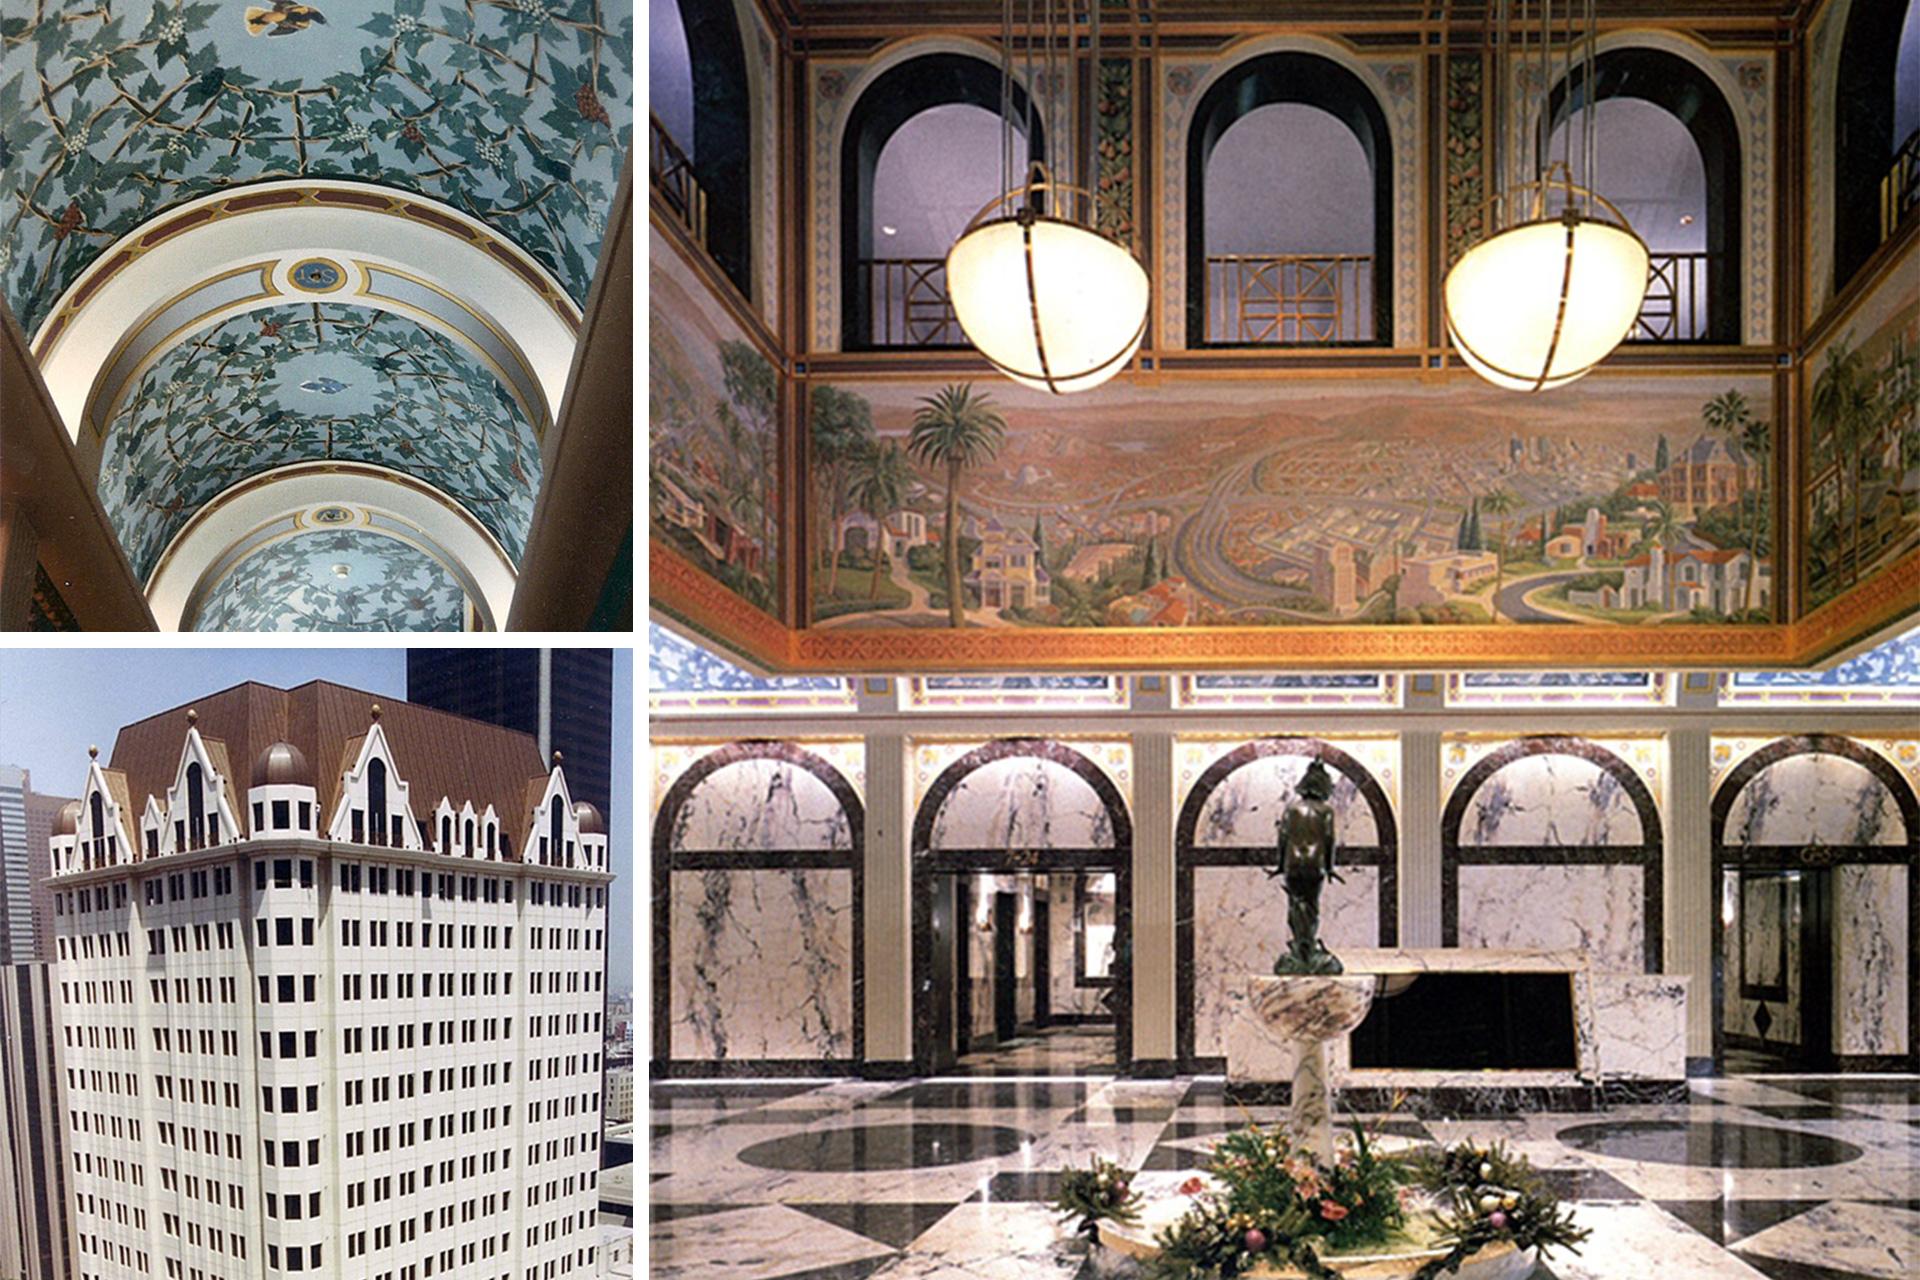 Sky Lobby, Home Savings of America Tower Los Angeles, CA. (1988)